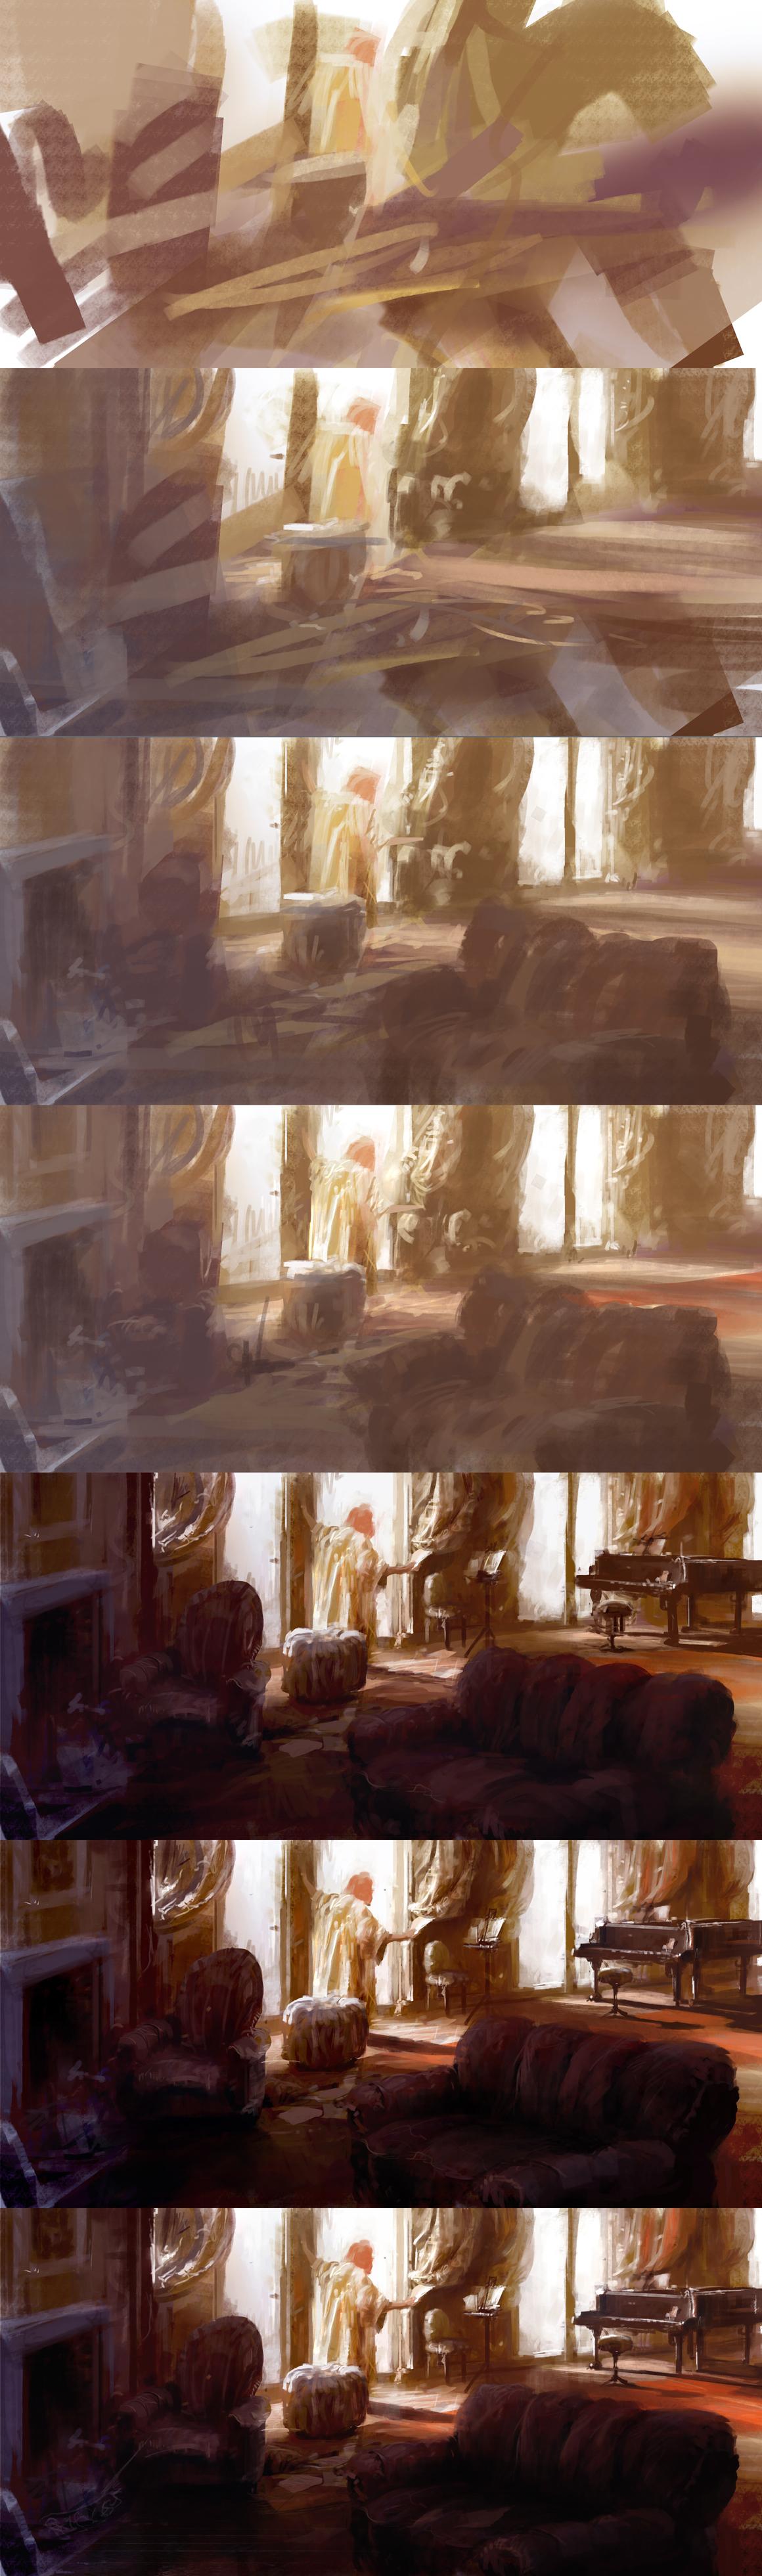 paint breakdown by leventep